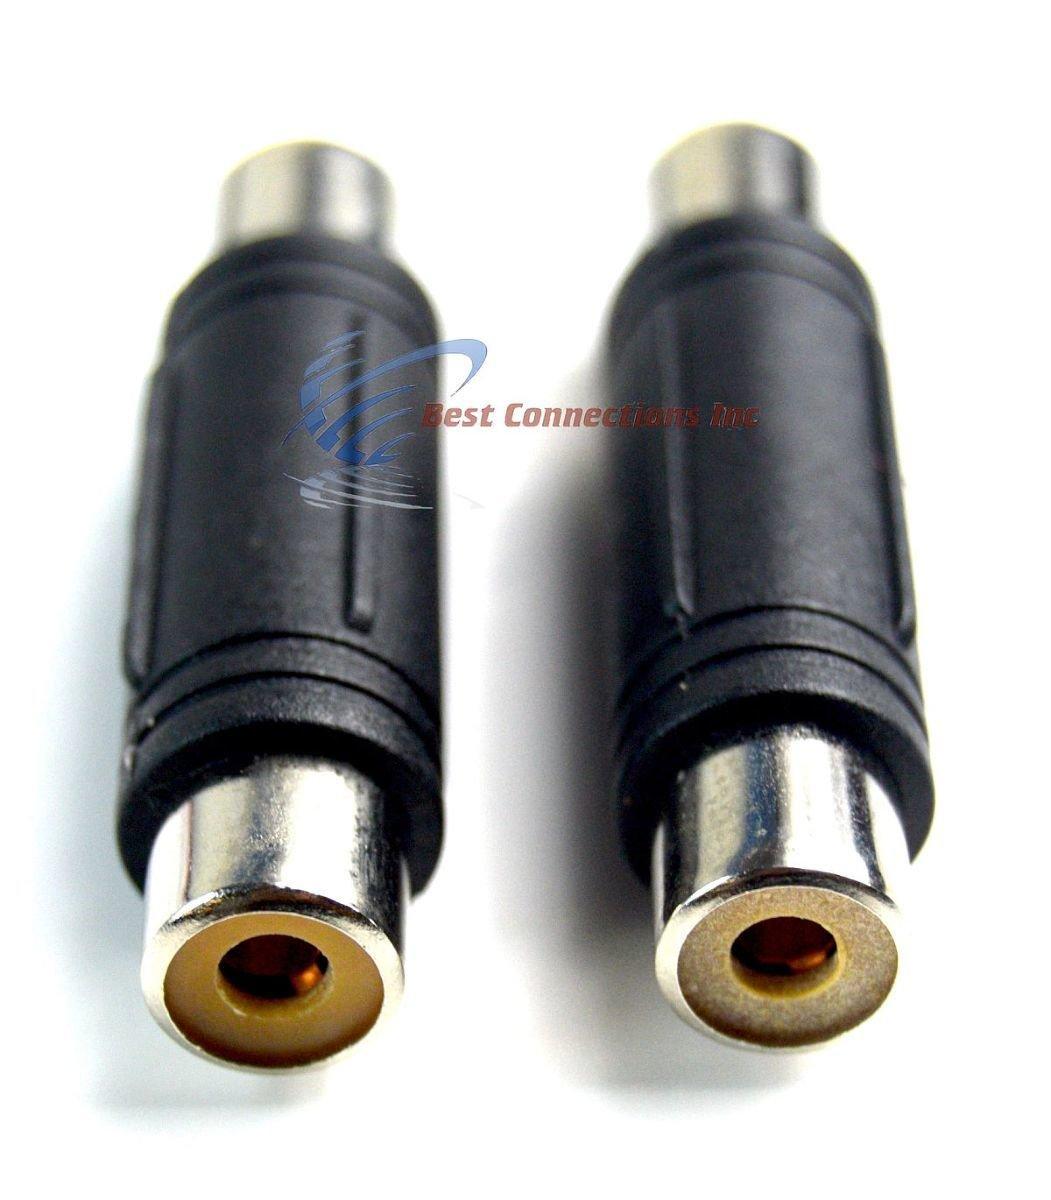 10 unidades cable de cable de oro rca hembra a hembra acoplador Joiner Barril Conectores: Amazon.es: Electrónica